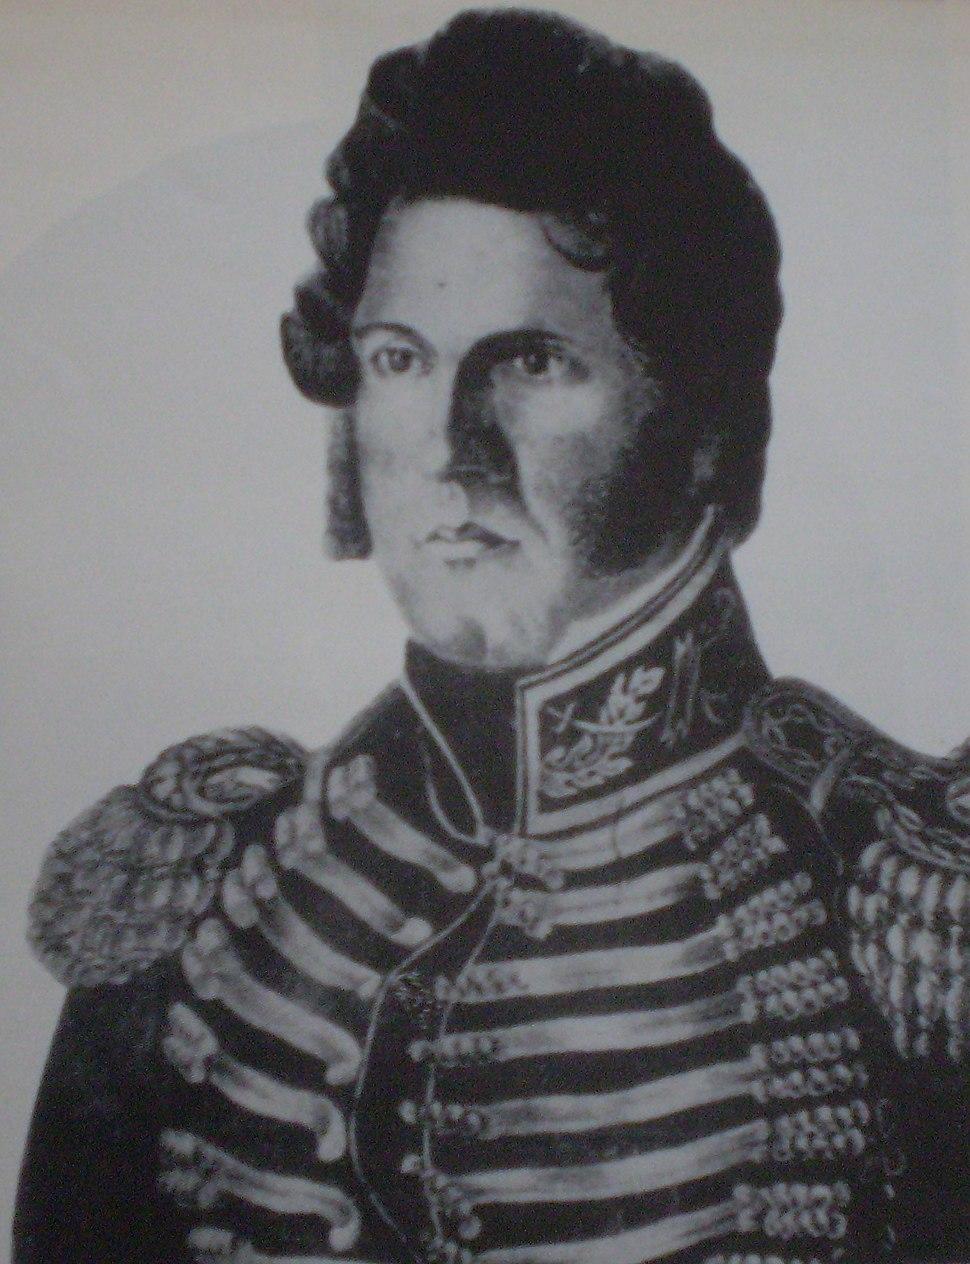 Pascual Echague